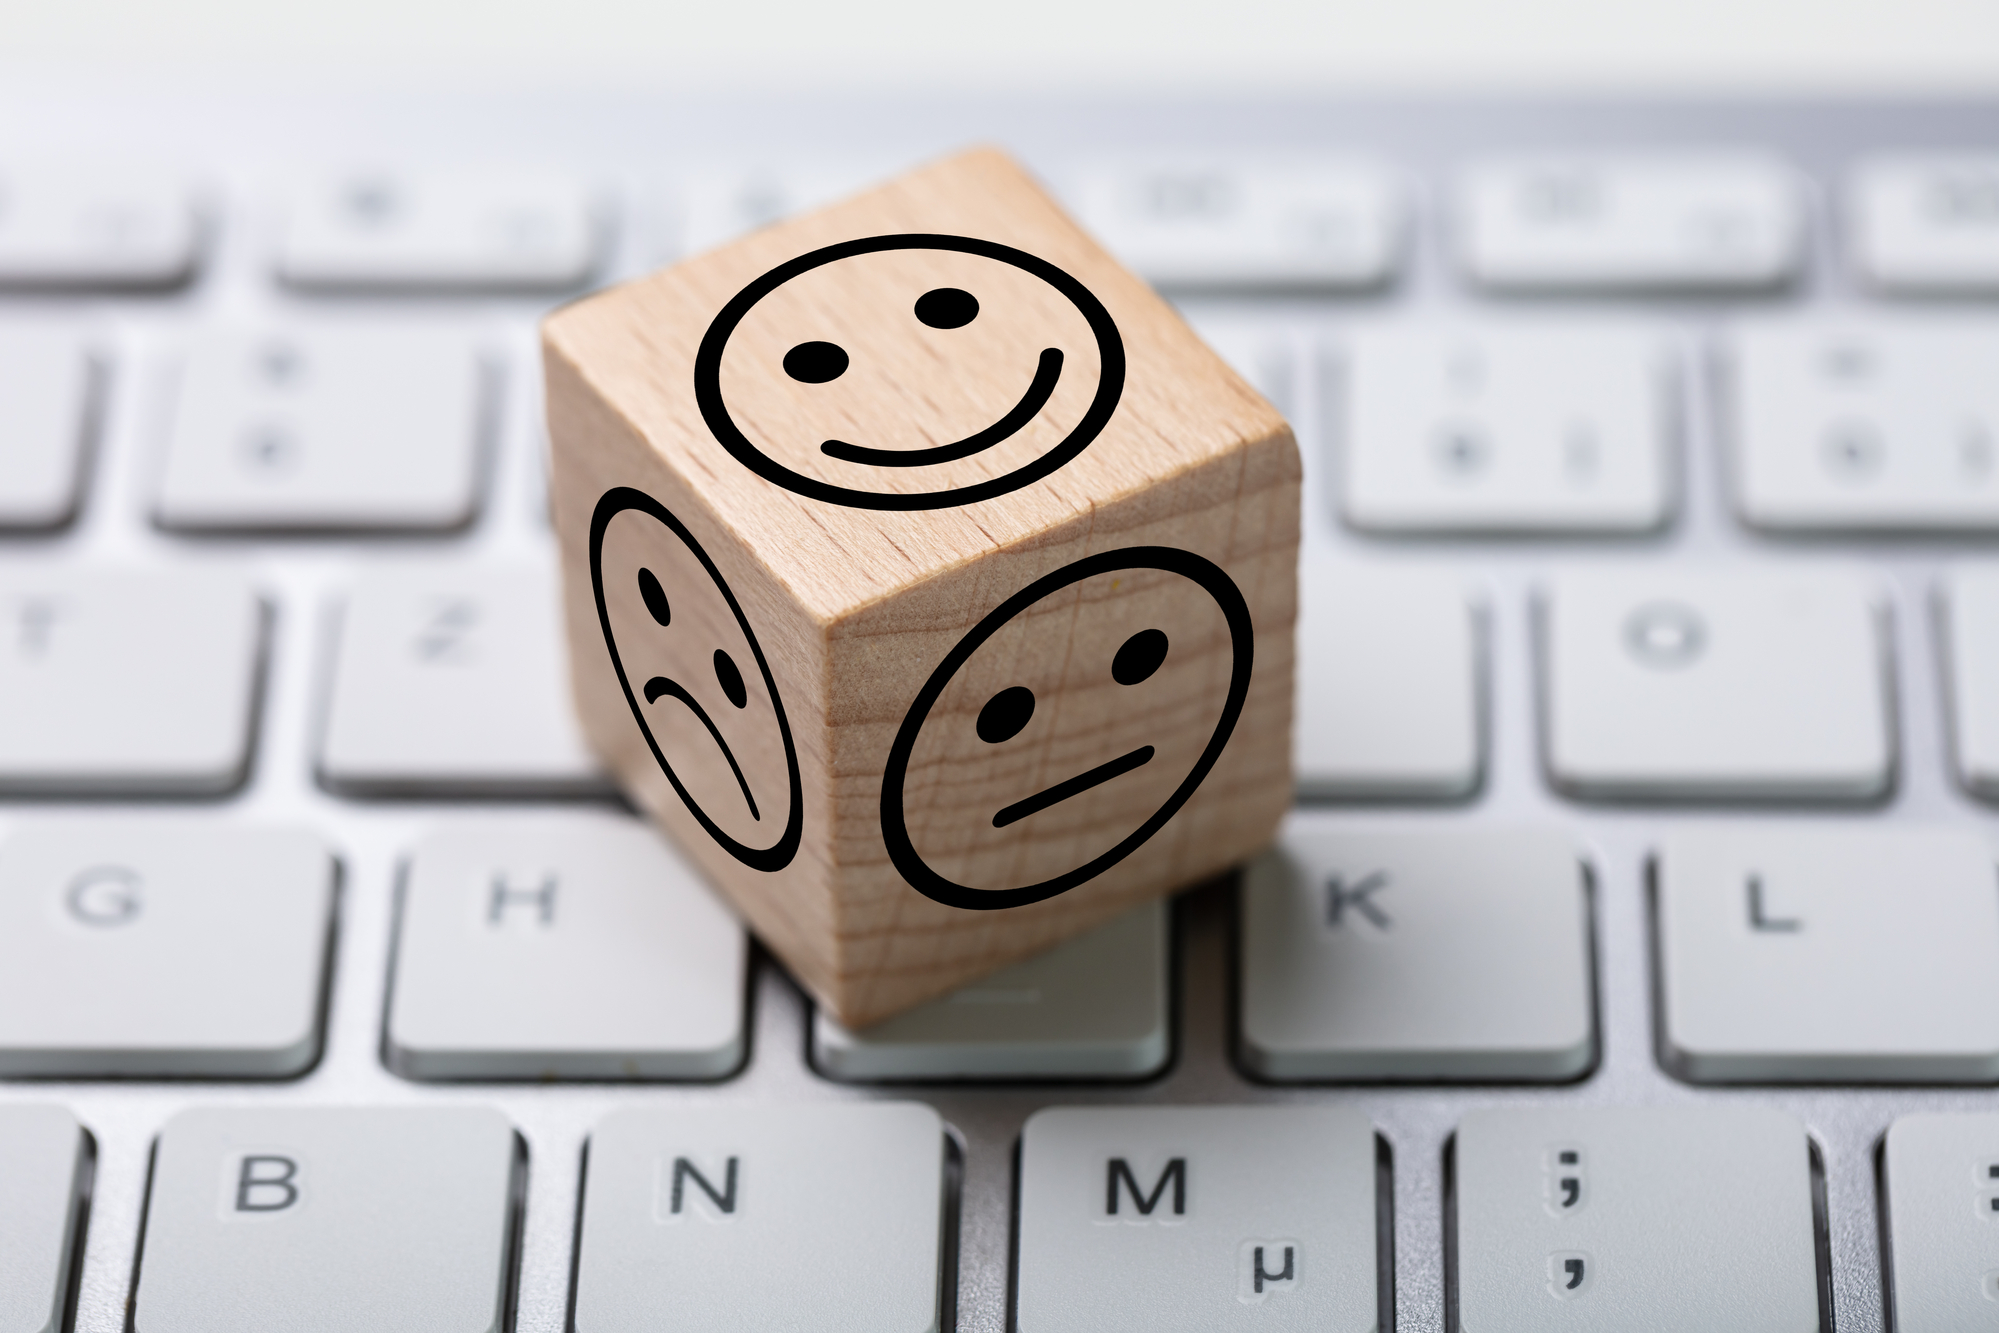 Online Service Satisfaction Survey Dice On Computer Keyboard